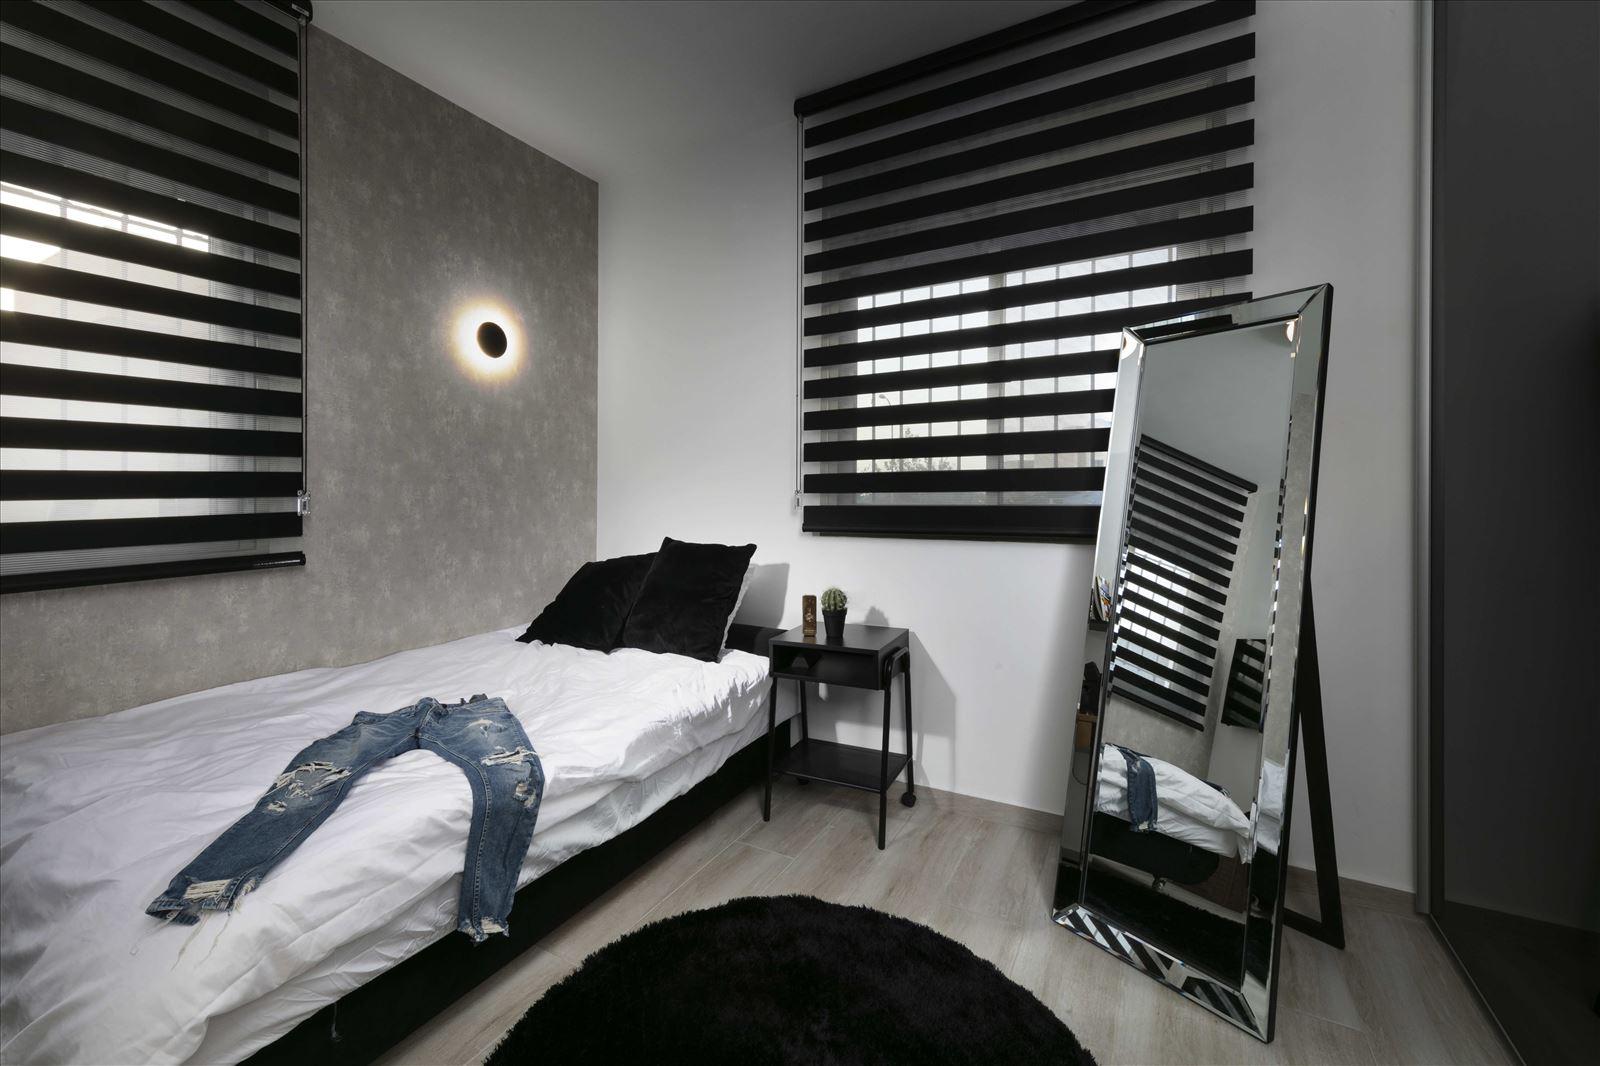 Lighting project private house גופי התאורה בחדר הותקנו על ידי דורי קמחי תאורה אדריכלית